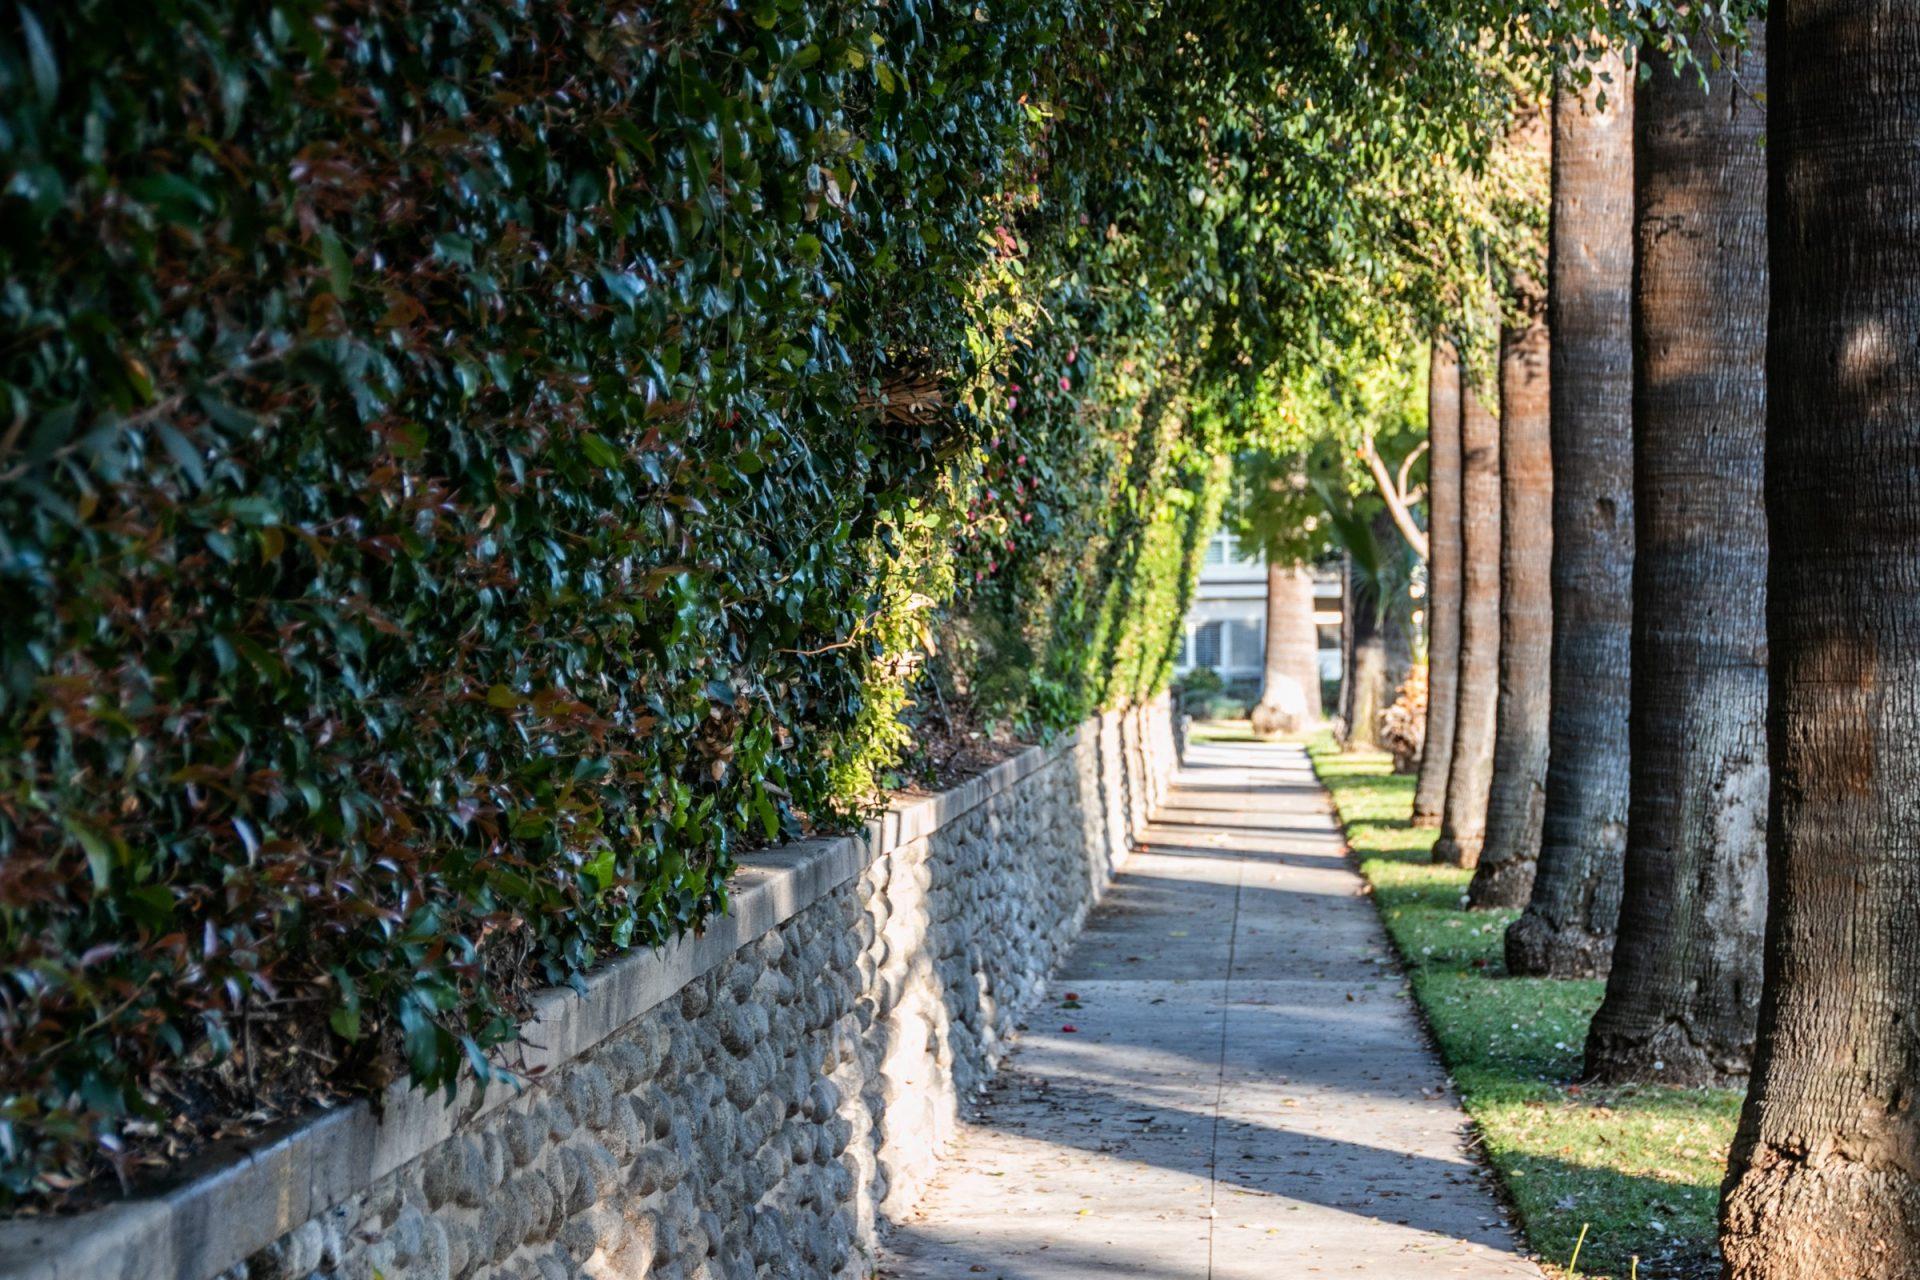 Sidewalk Between Trees And Hedge Wall